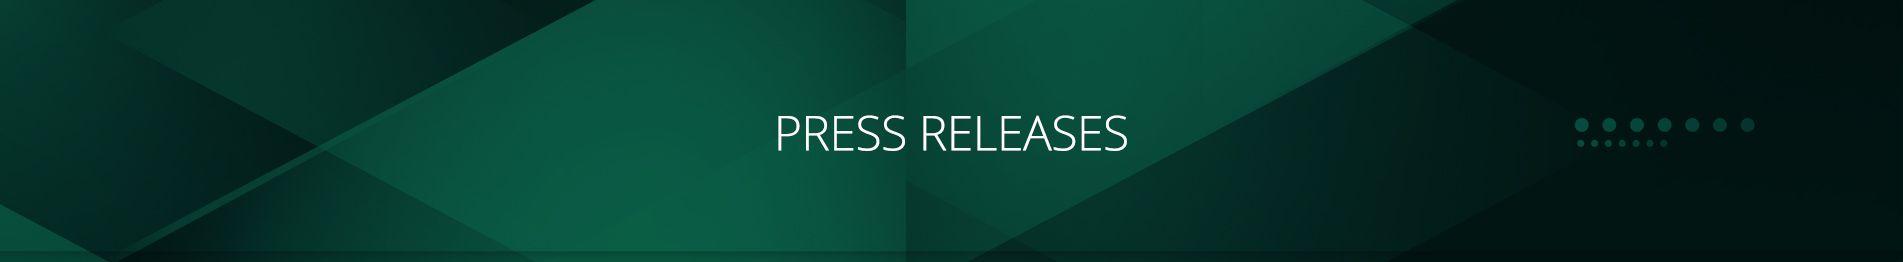 Envent Corporation | Press Releases